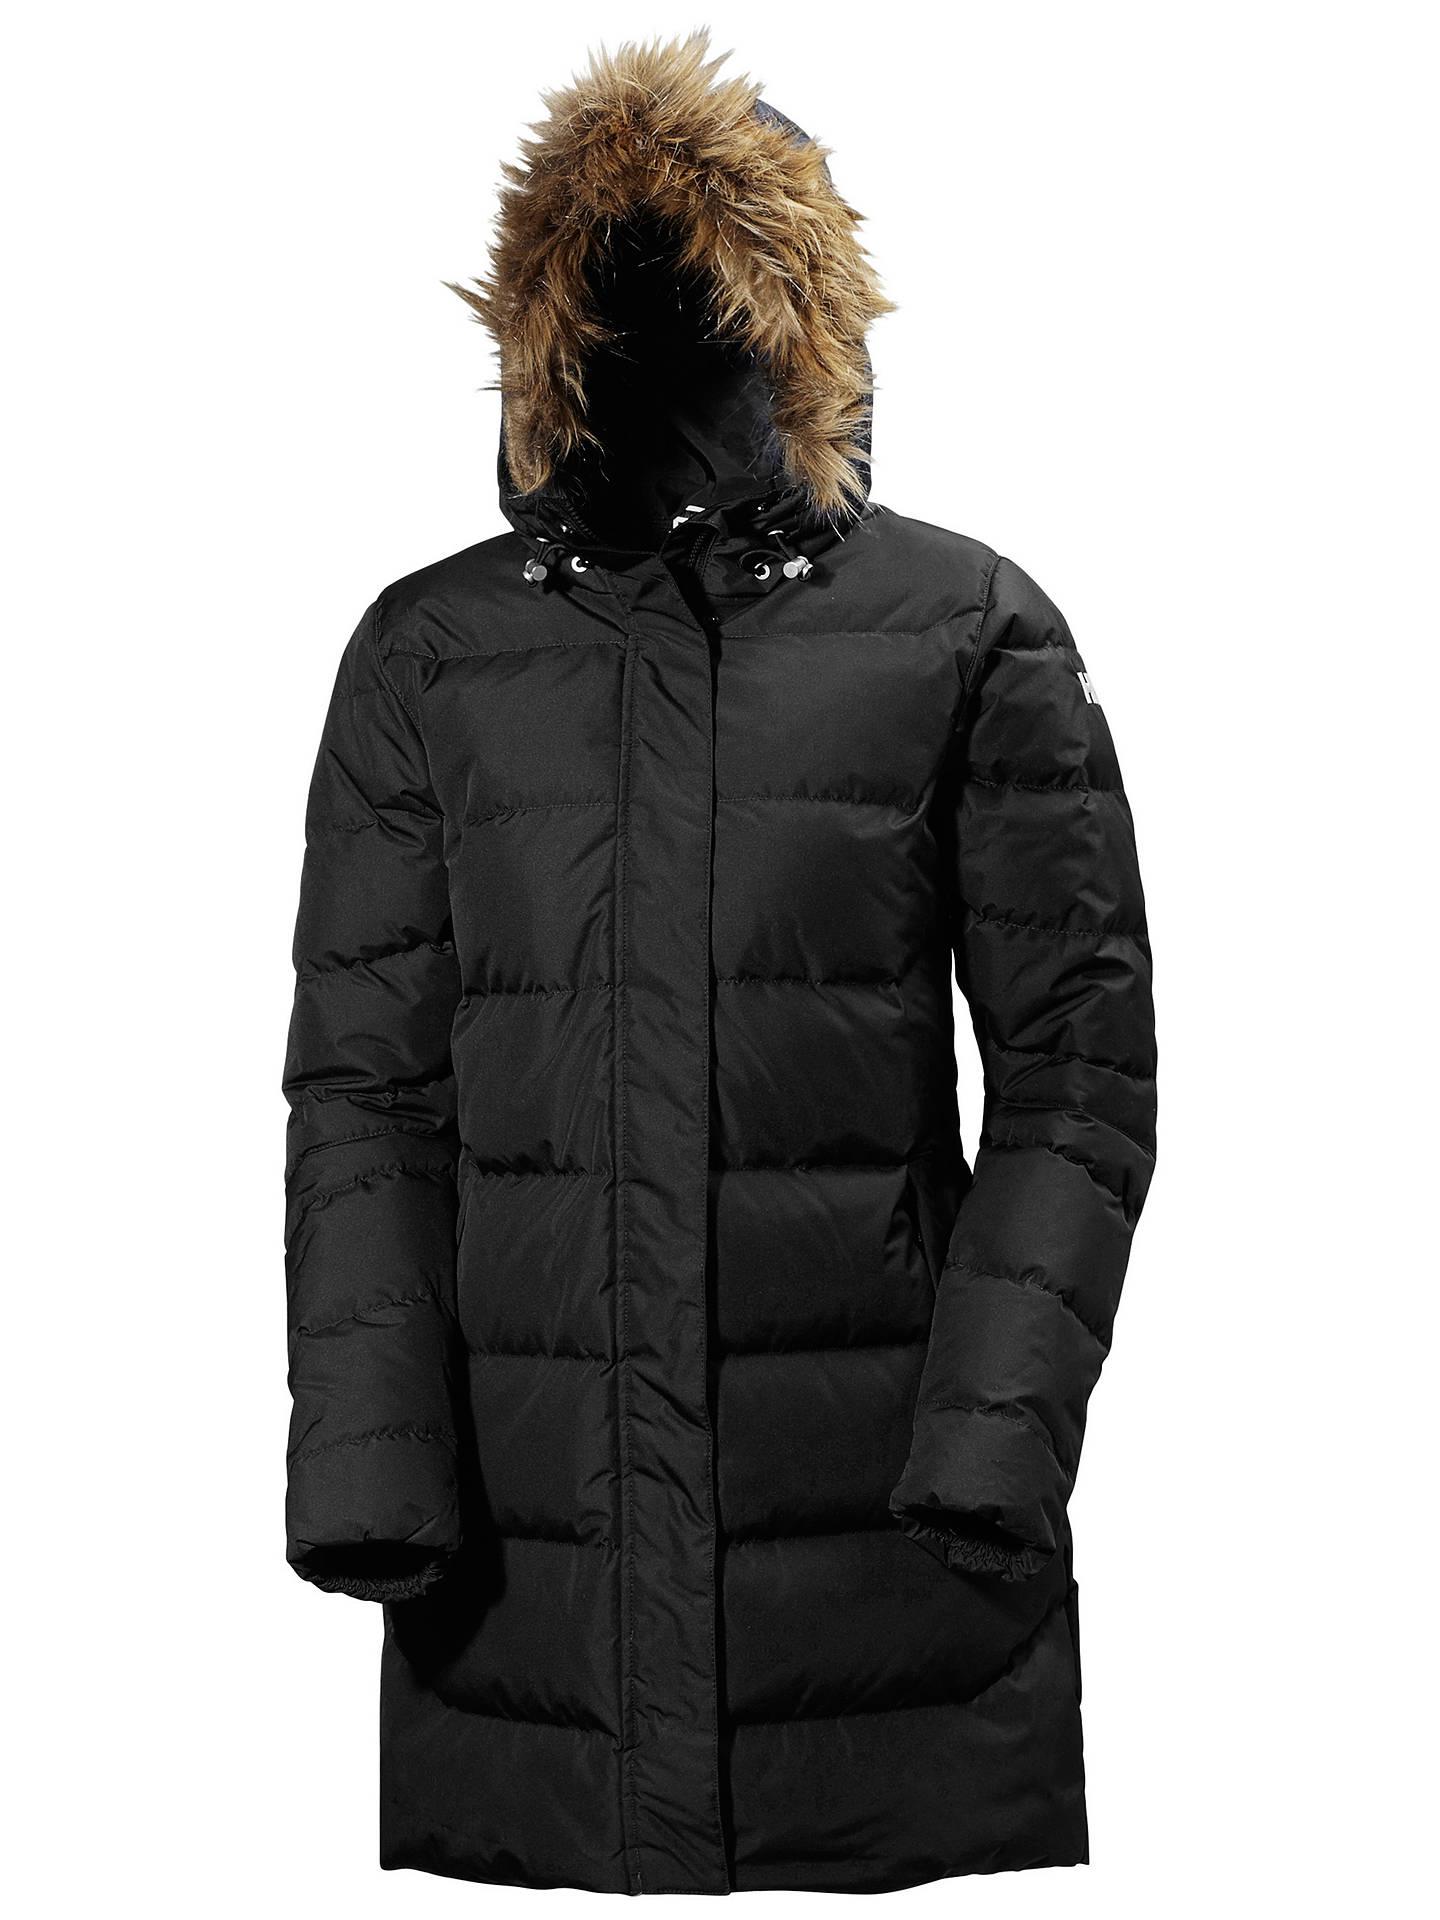 56e30765331 Helly Hansen Aden Down Women's Parka Jacket, Black